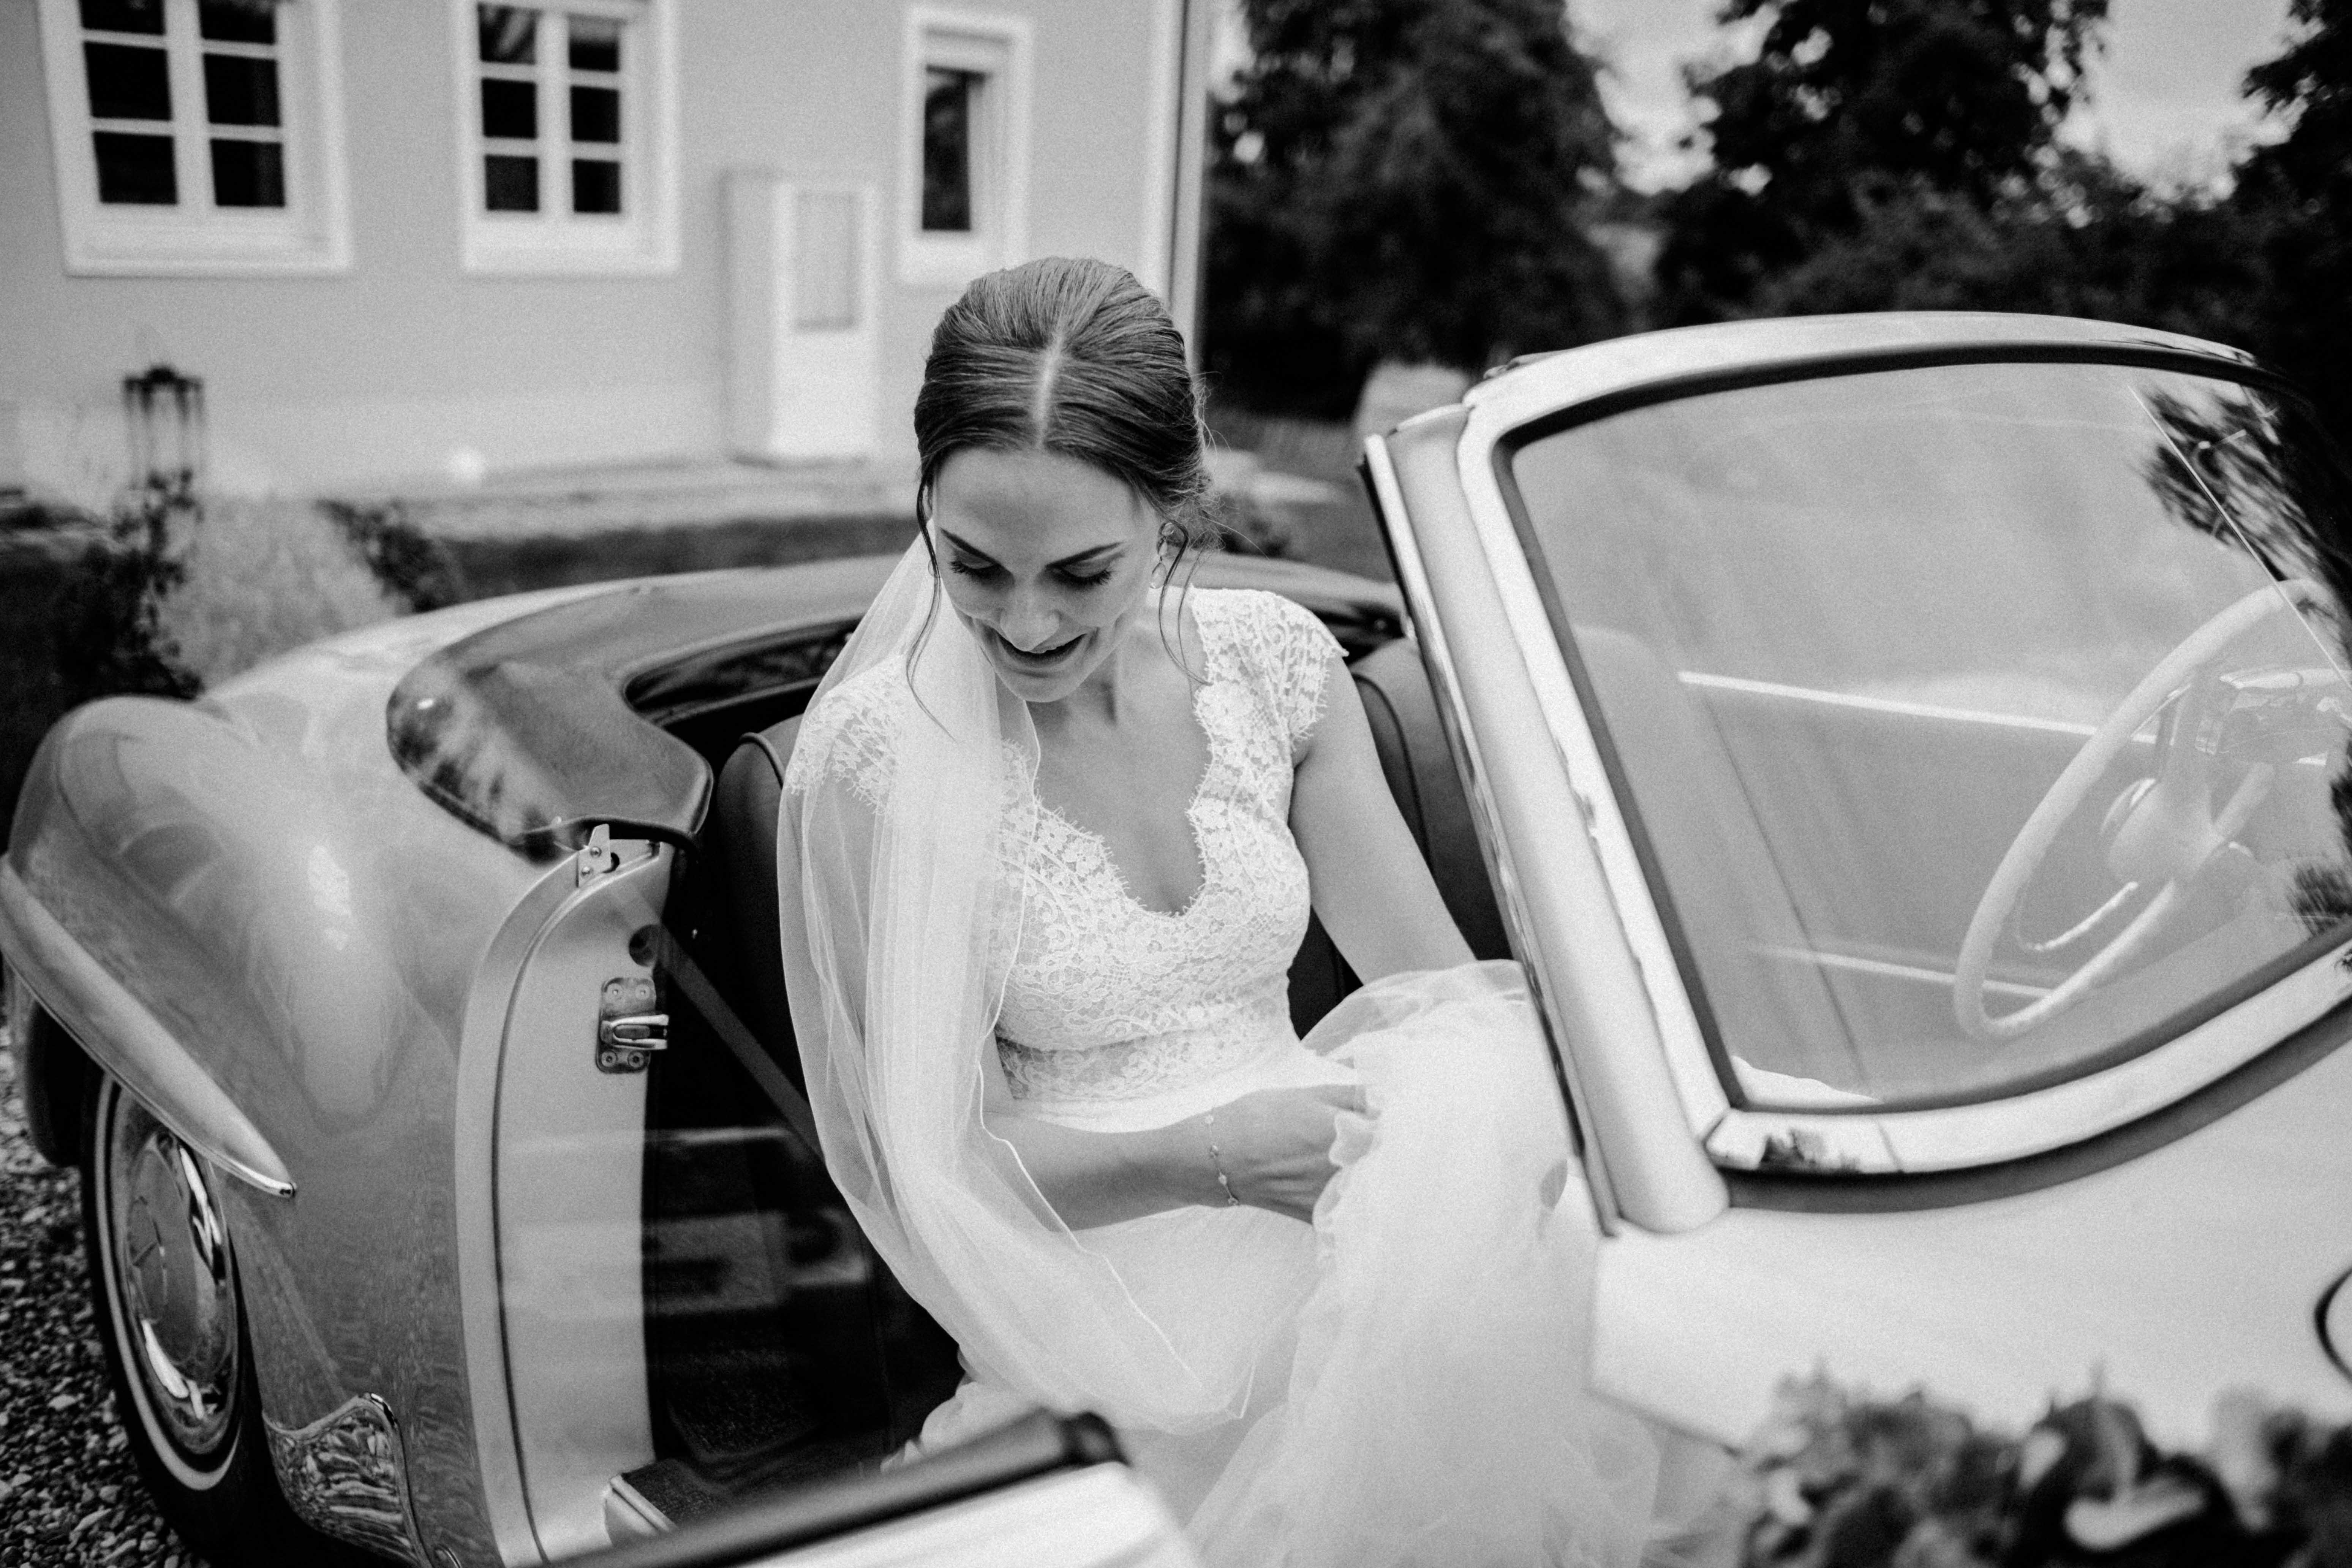 oldtimer auto sonja poehlmann photography couples muenchen bayern